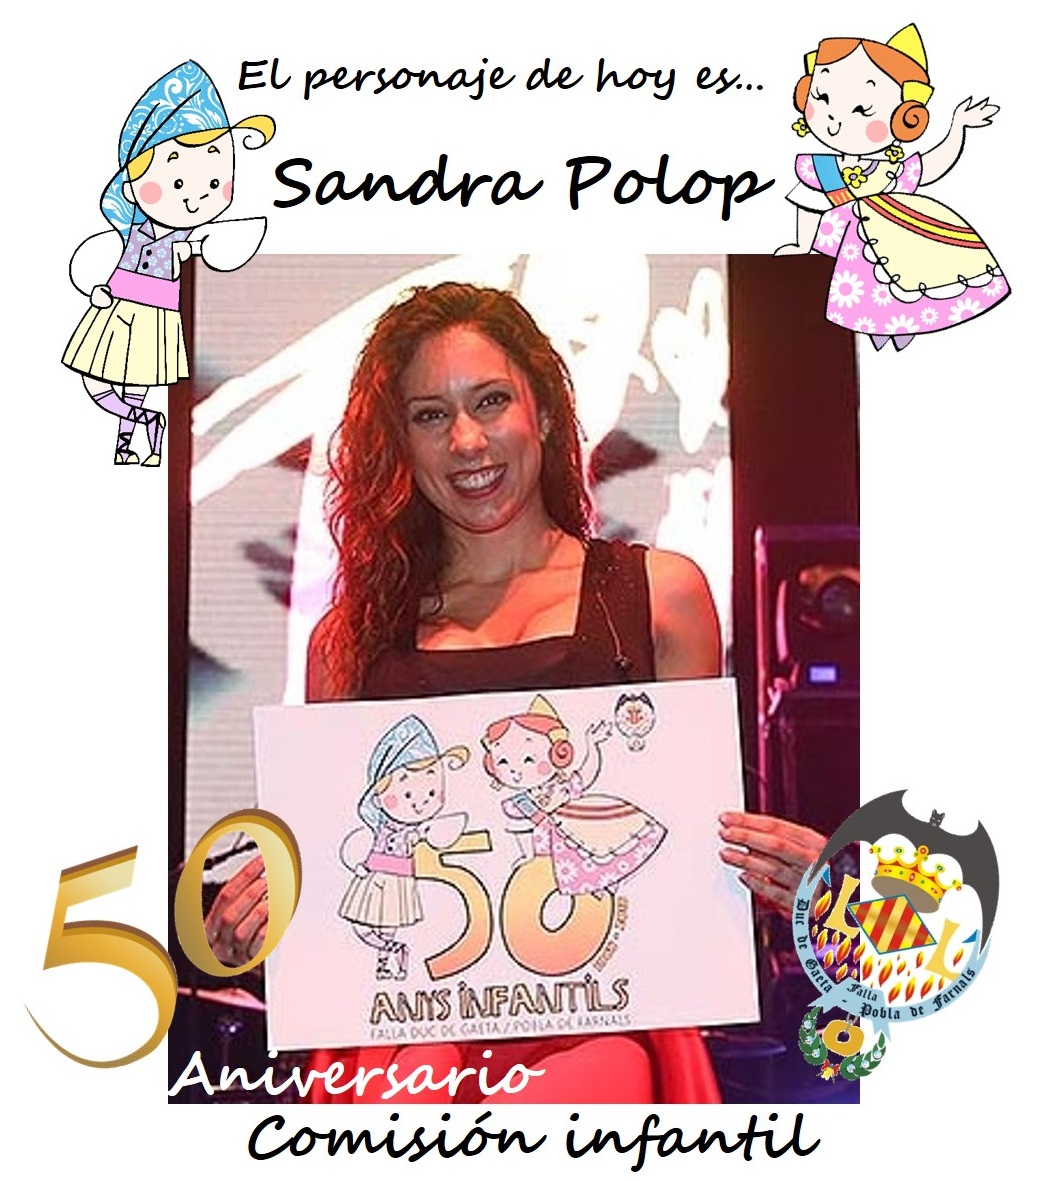 Personaje del día: Sandra Polop @SandraPolopN @sandrapolop